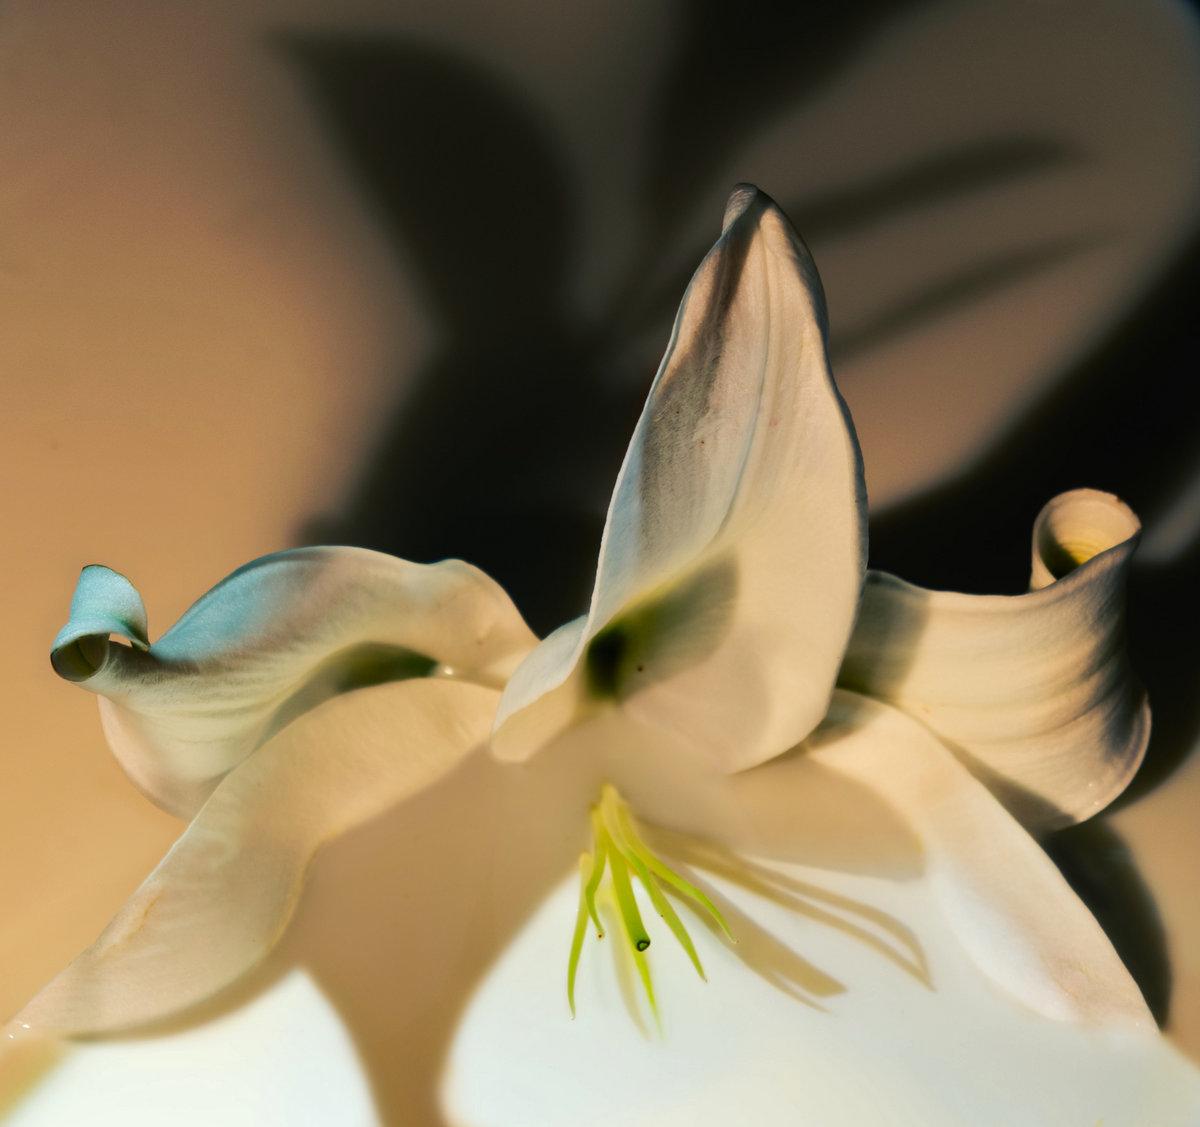 Cruel Spring | Needle Play